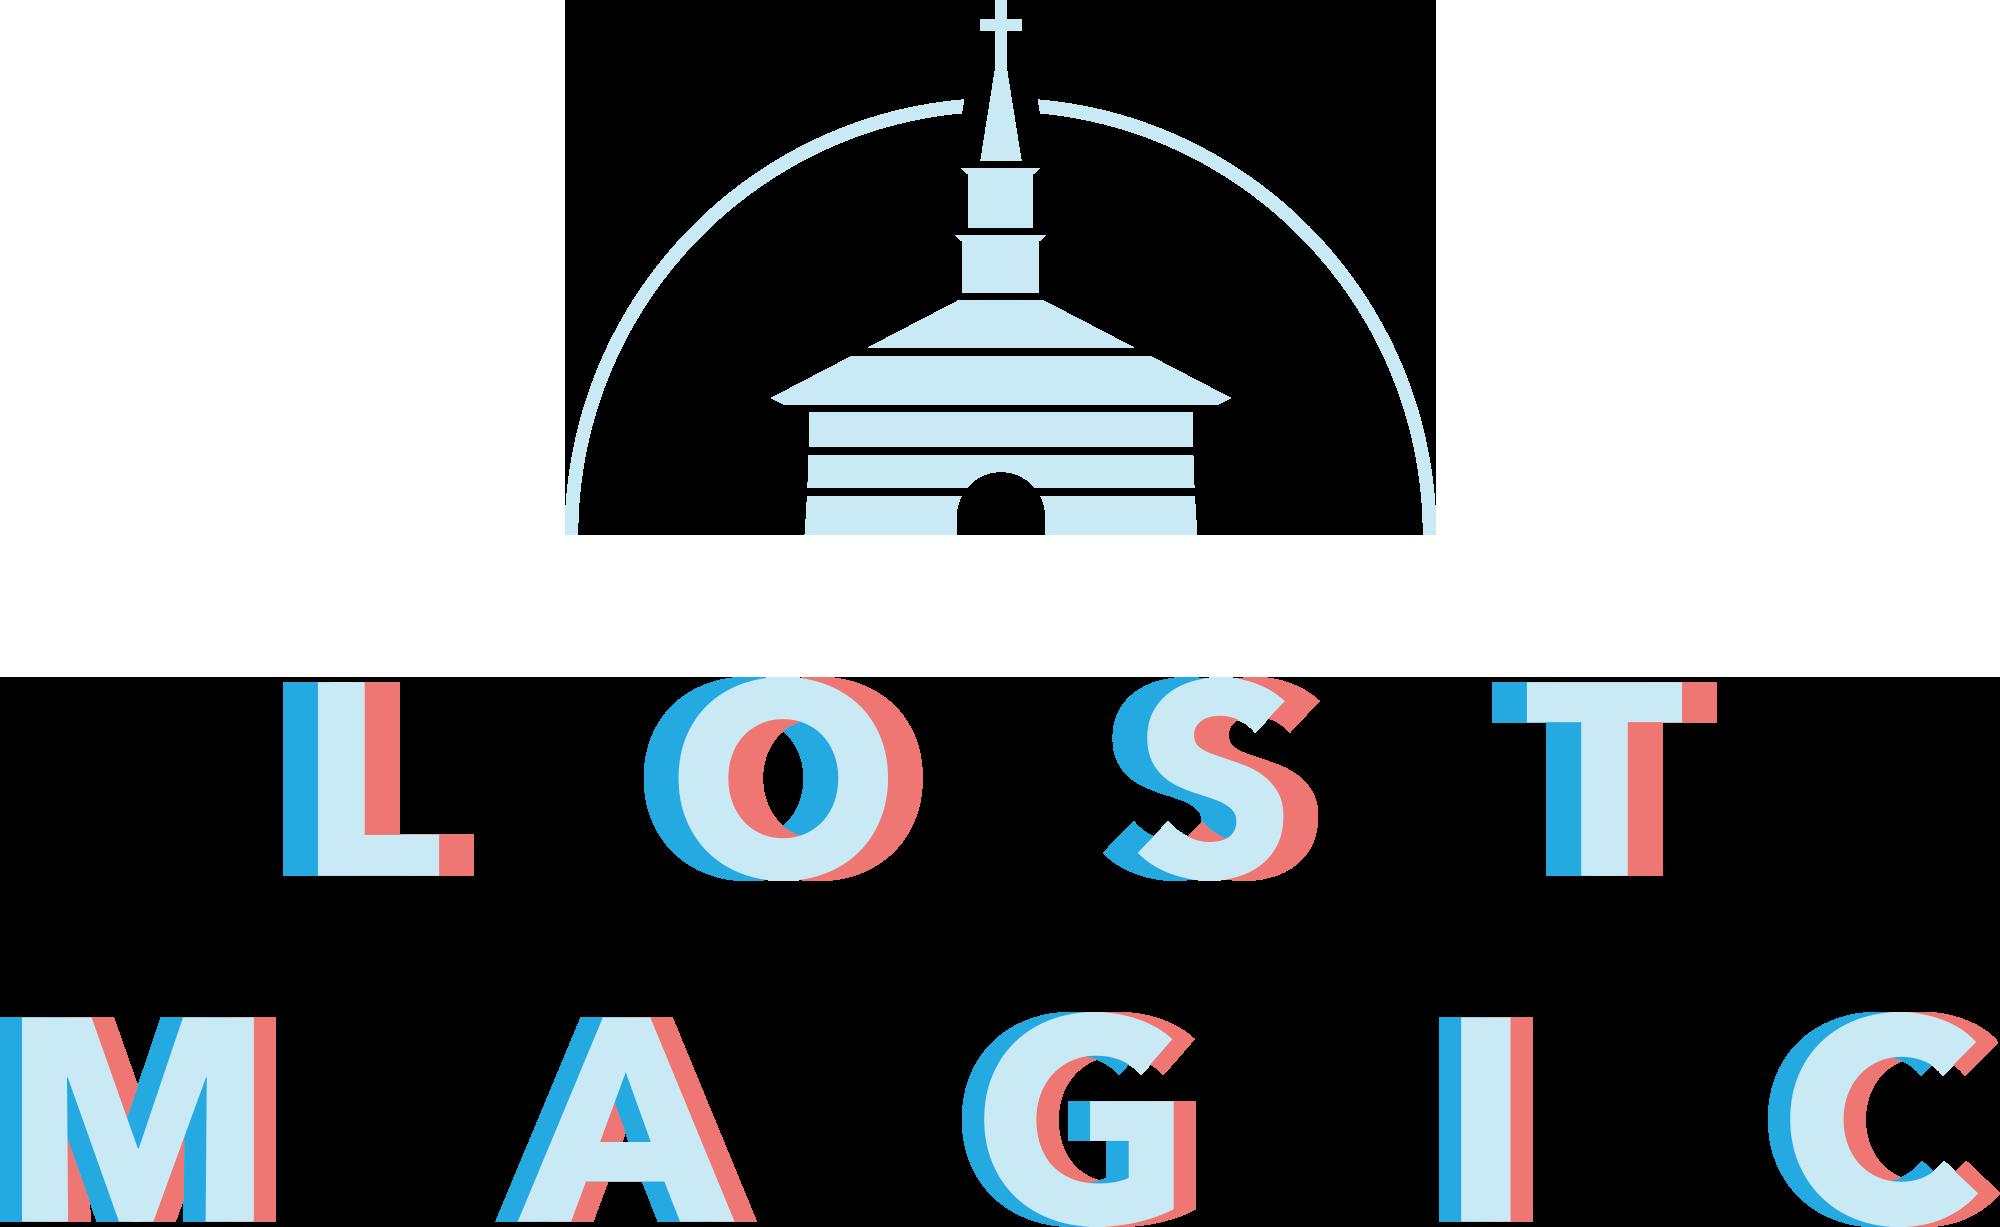 lost-magic-hero-graphic.png